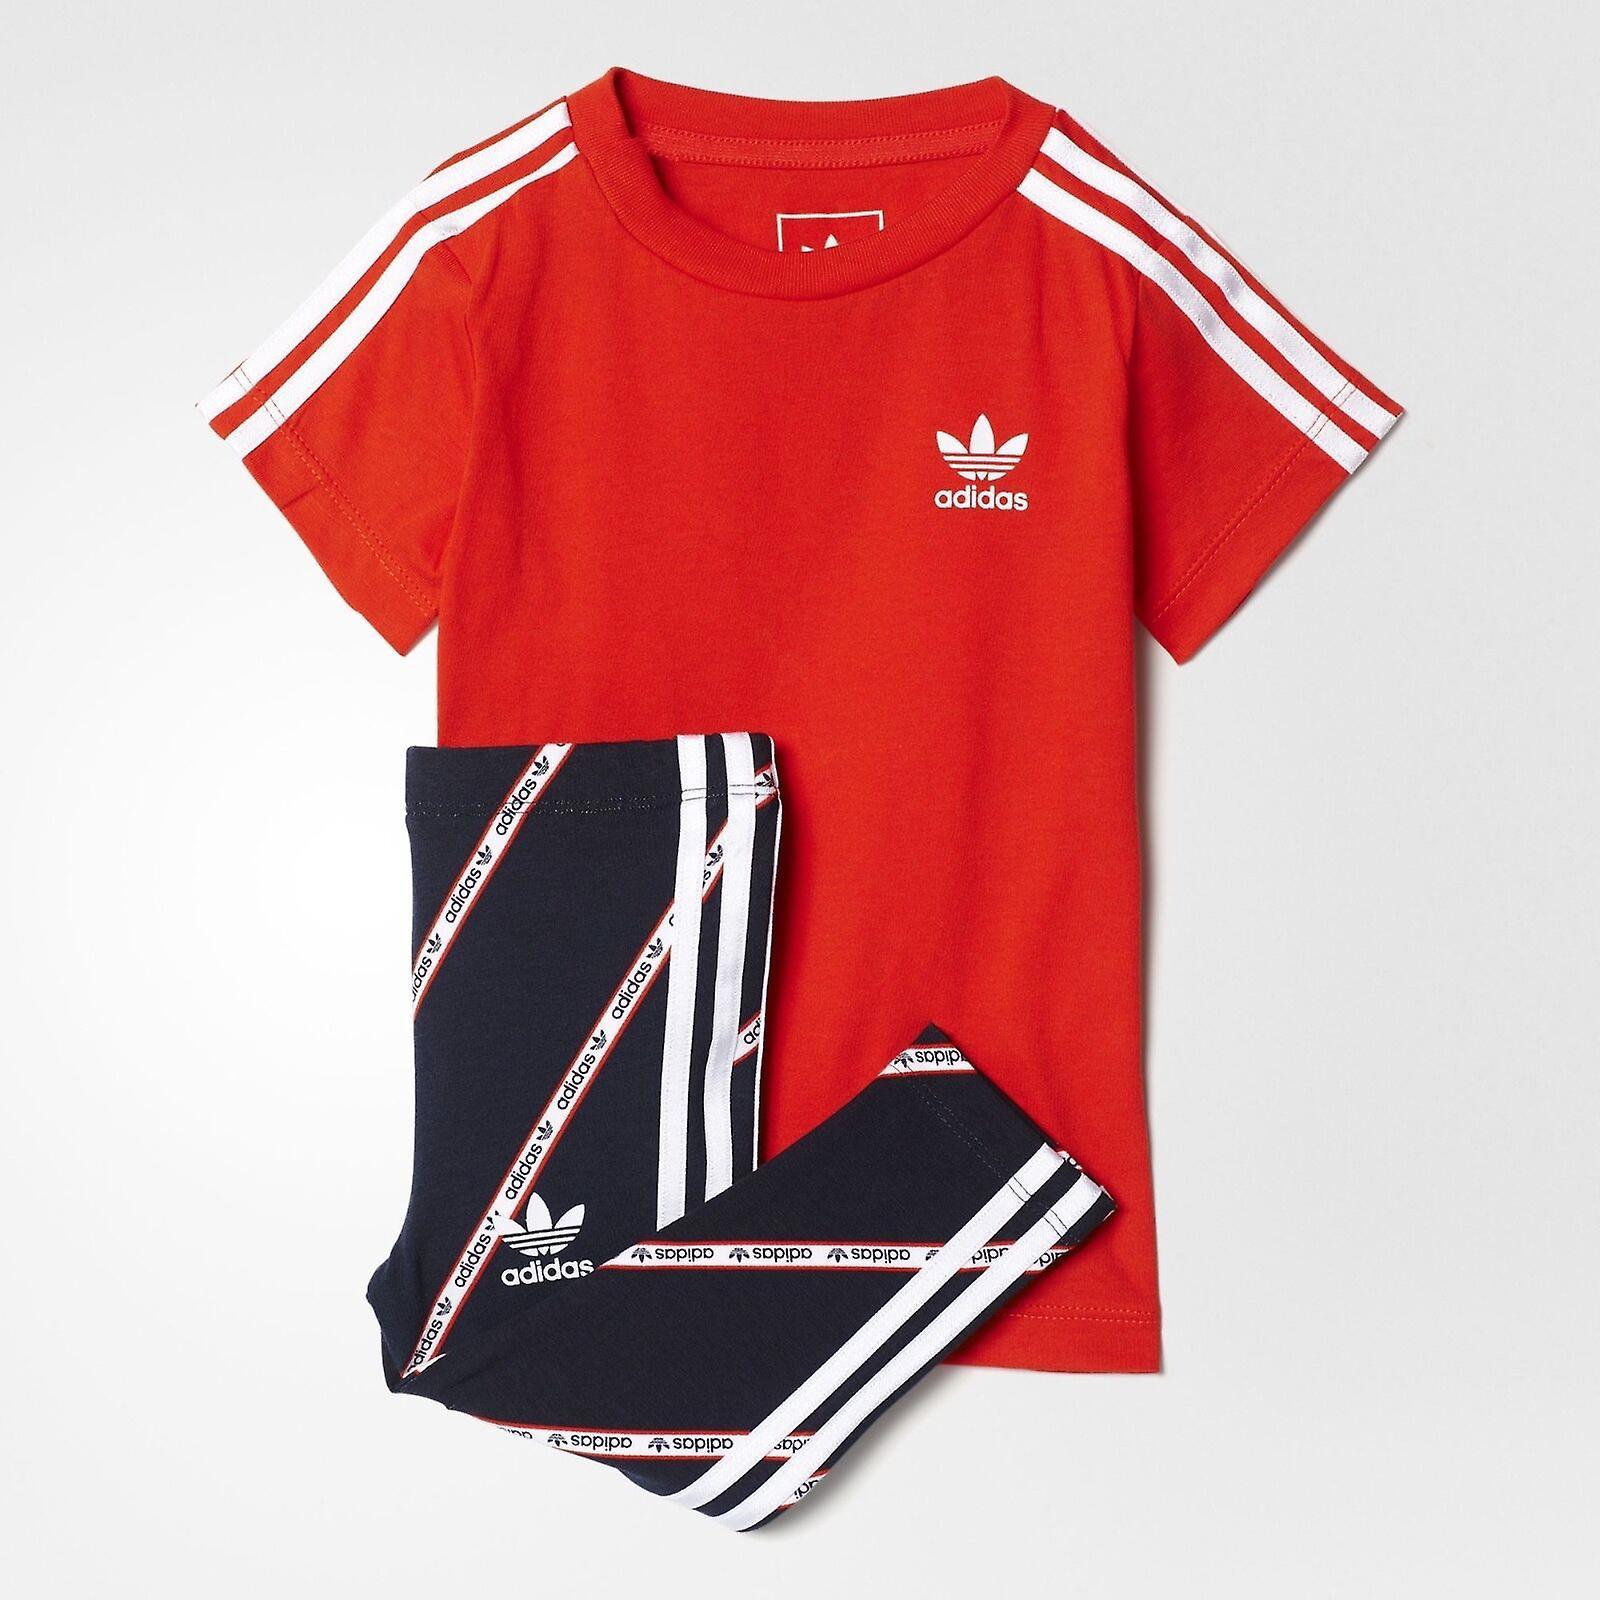 adidas shirt and leggings set